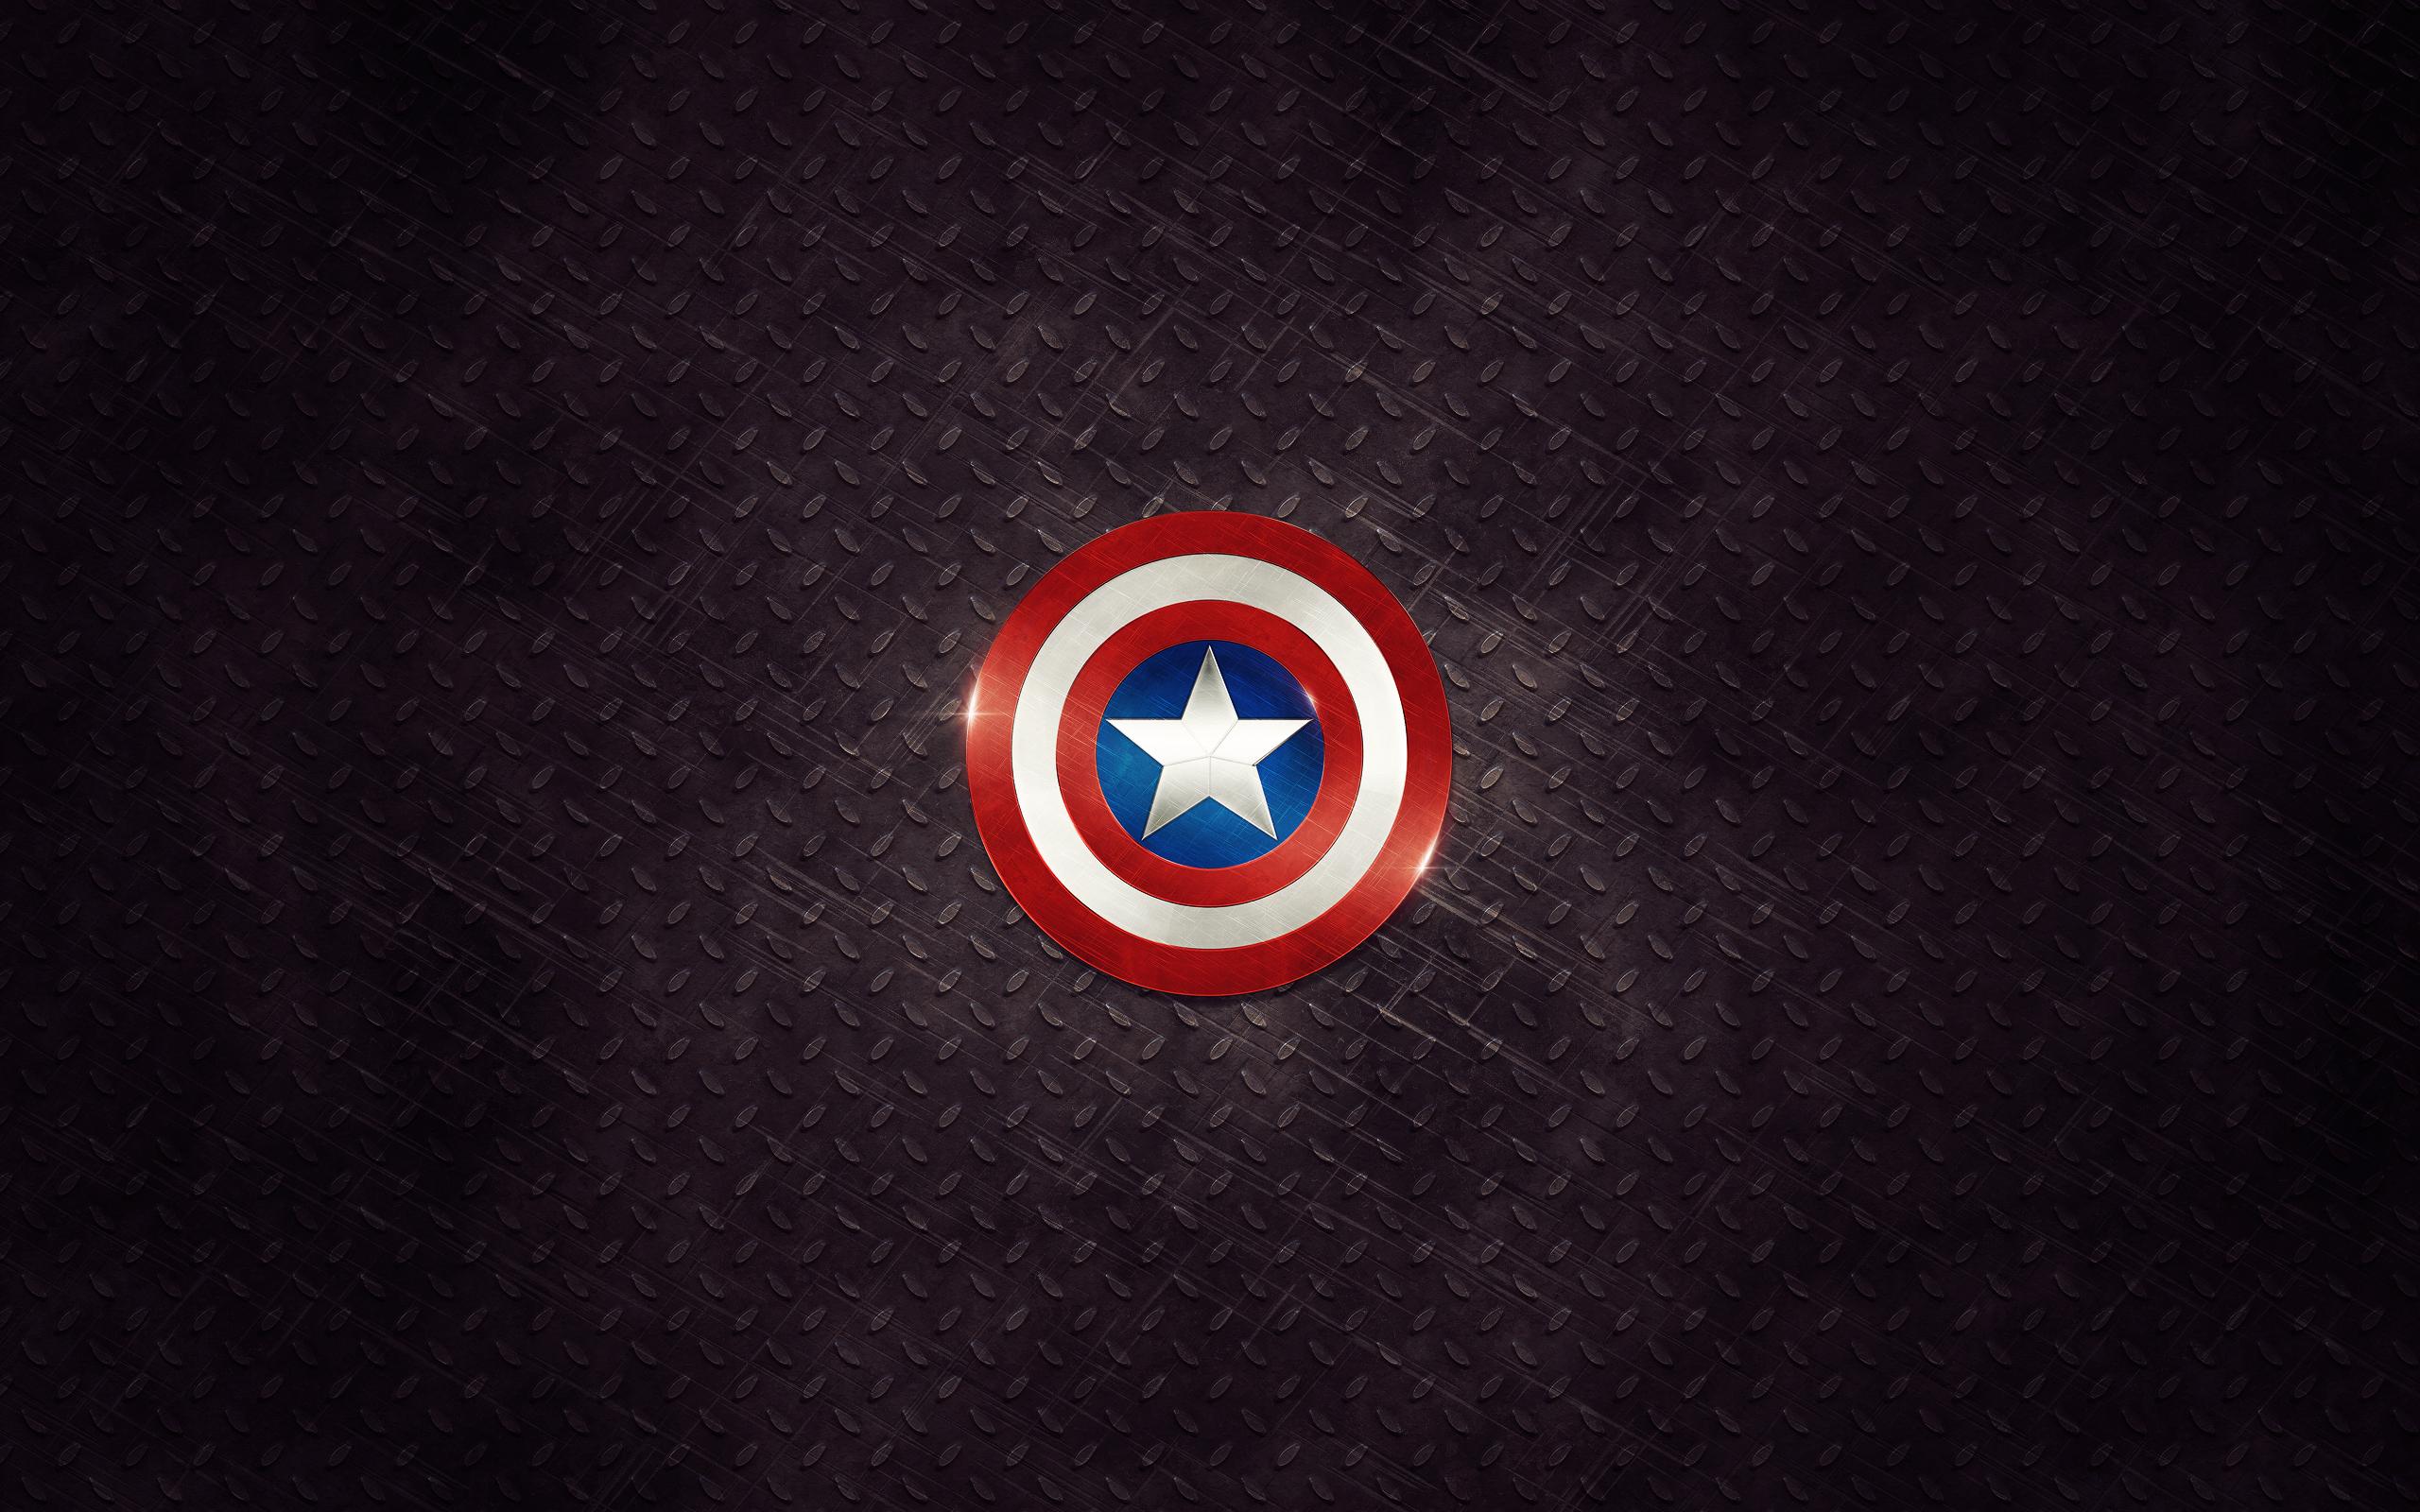 Captain America Movie Wallpaper 14369 Wallpaper Cool Wallpaper 2560x1600